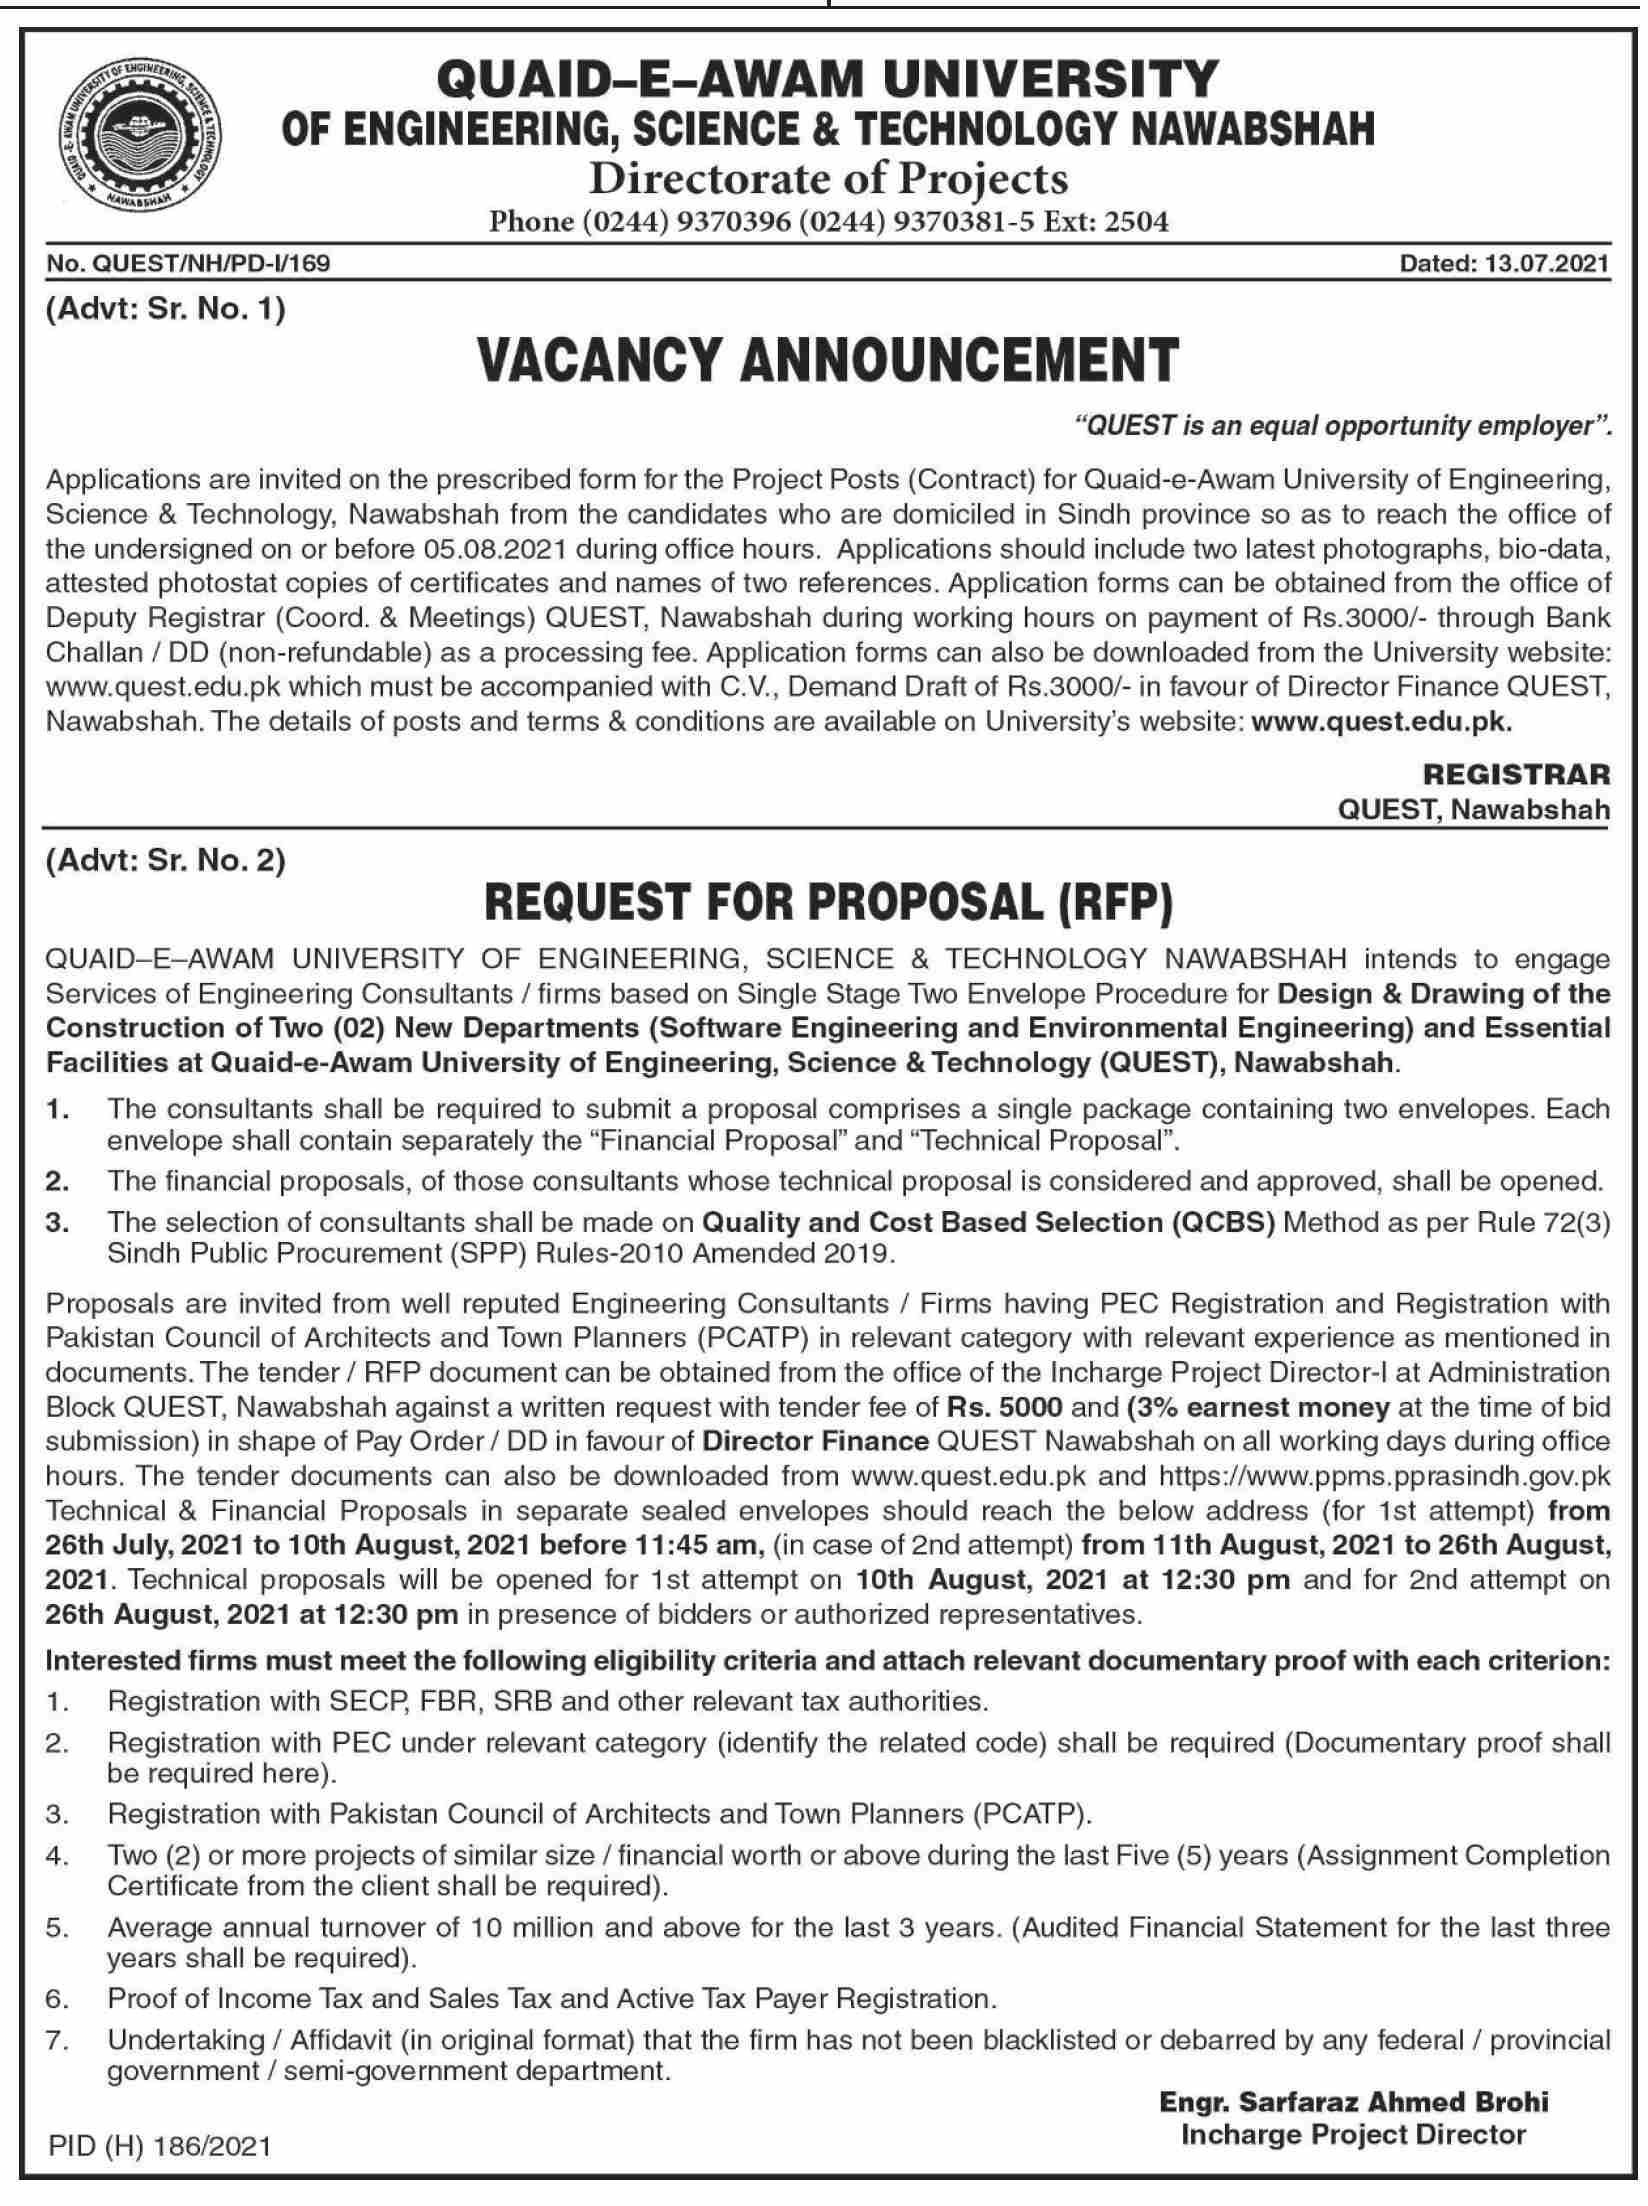 Quaid a Awan University Nawabshah Jobs 2021 in Pakistan